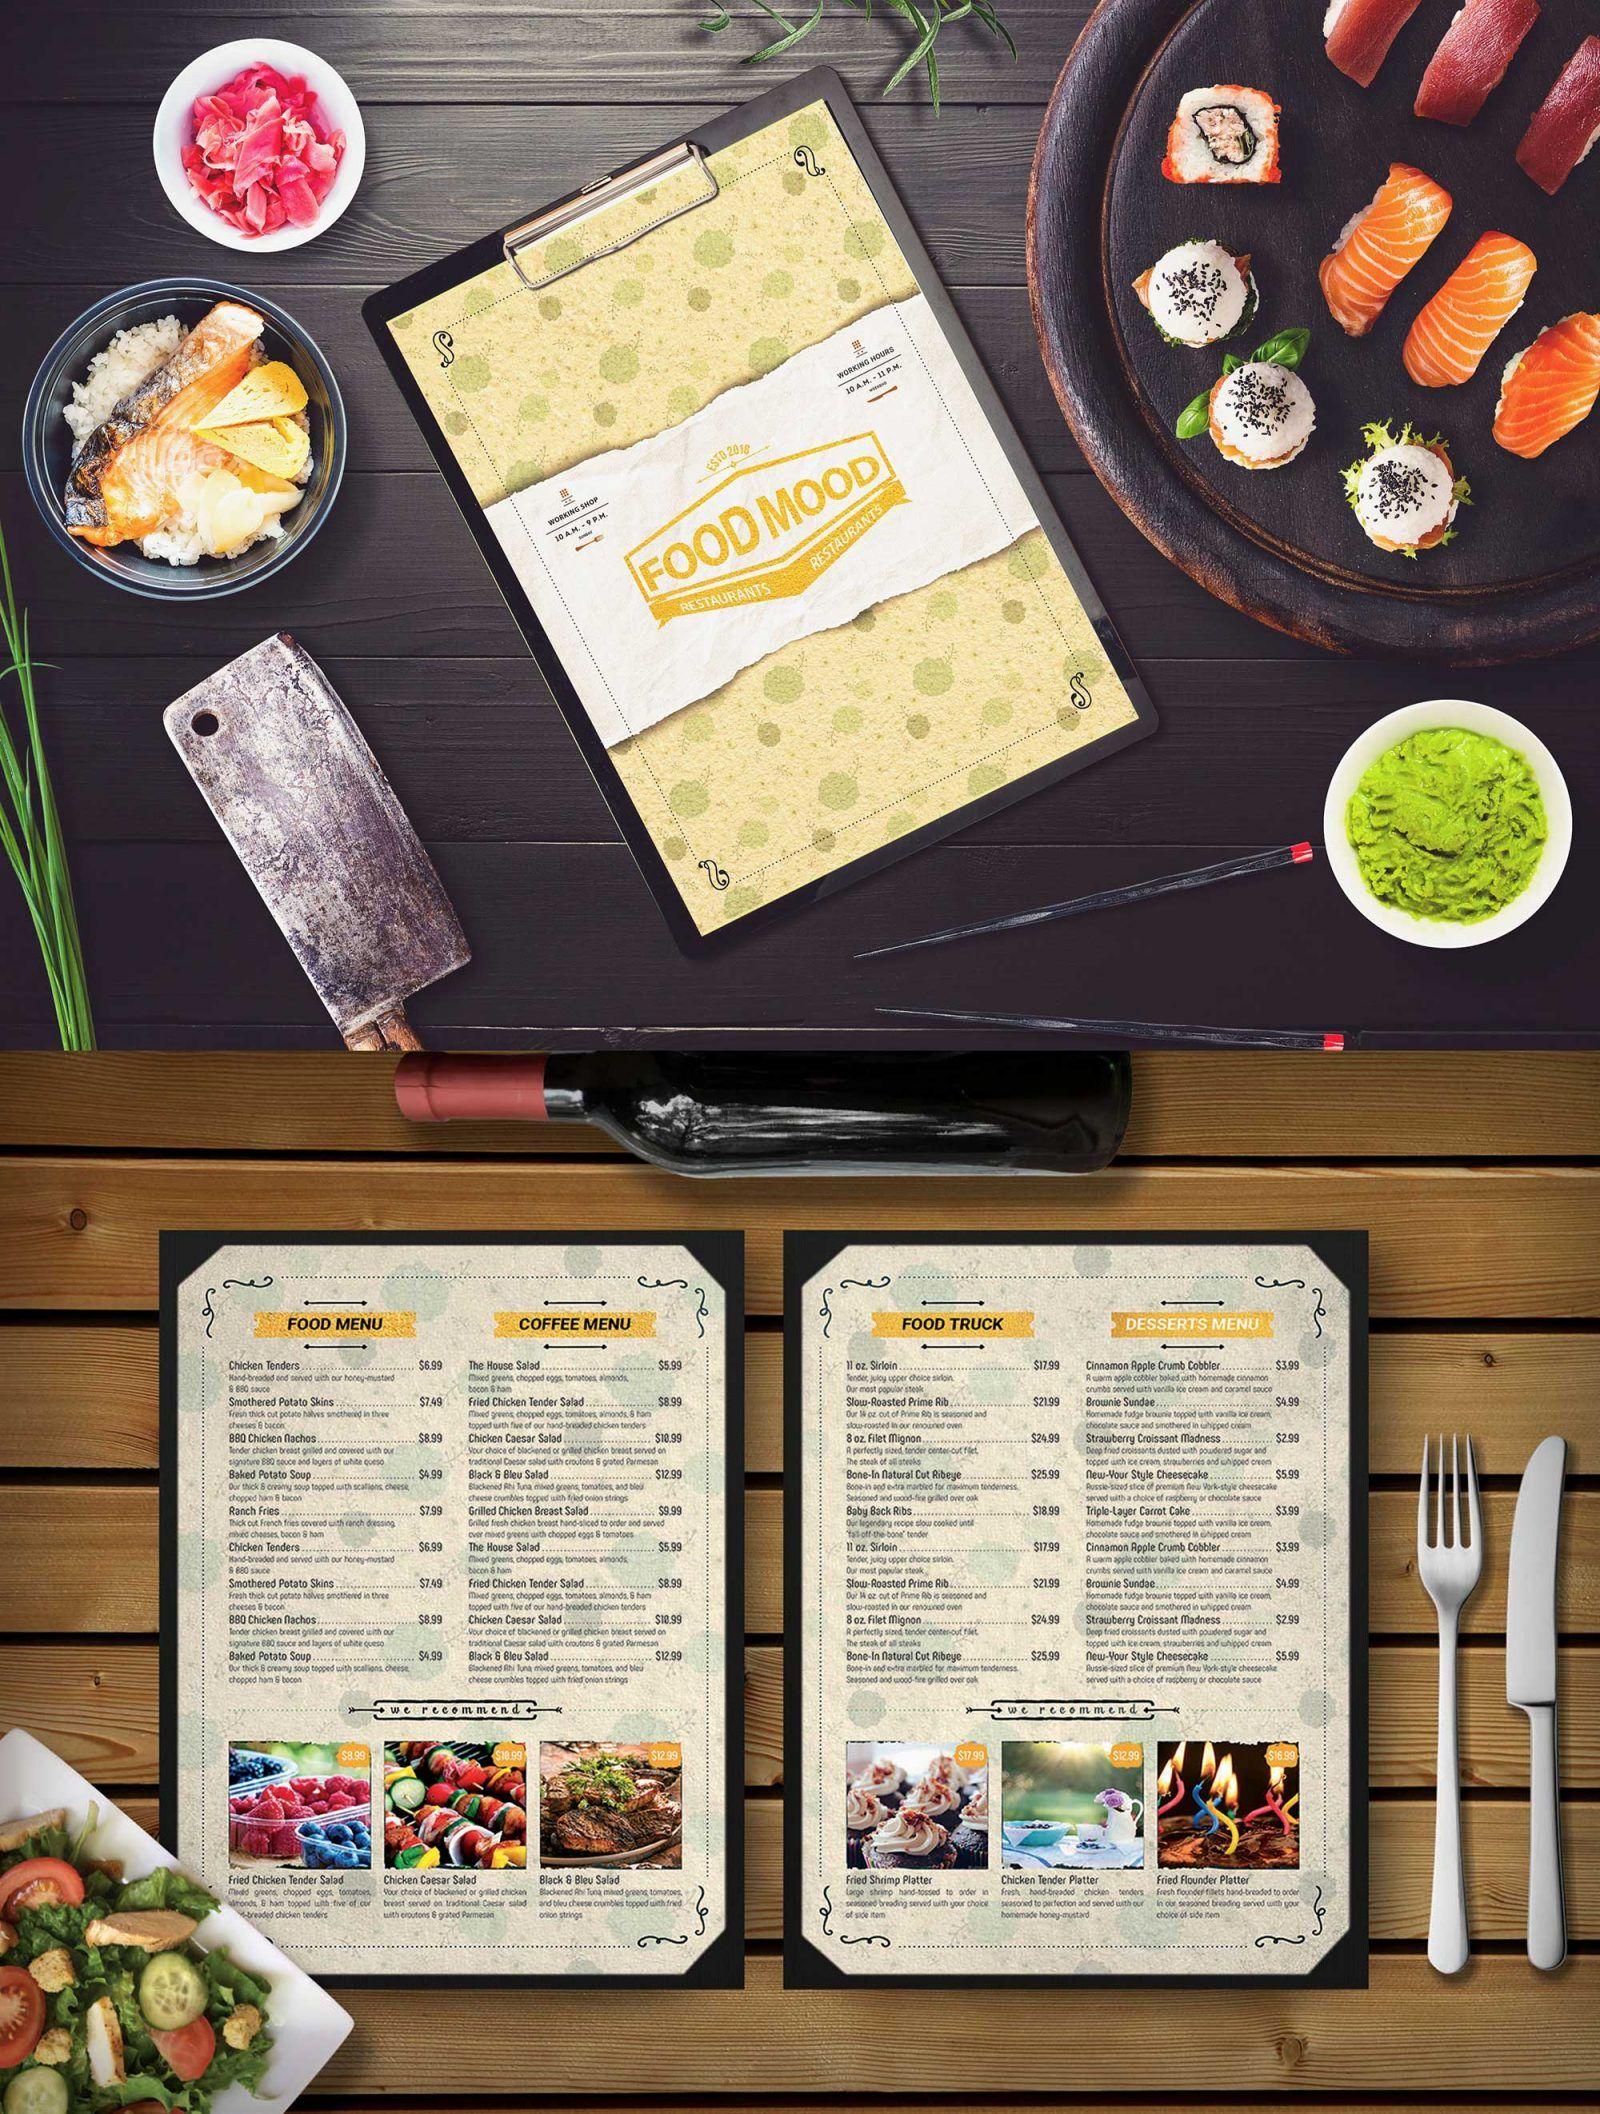 Cafe Menu Card Psd Mockup Available For Free Cafe Menu Card Psd Mockup Menu Card Design Cafe Menu Menu Template